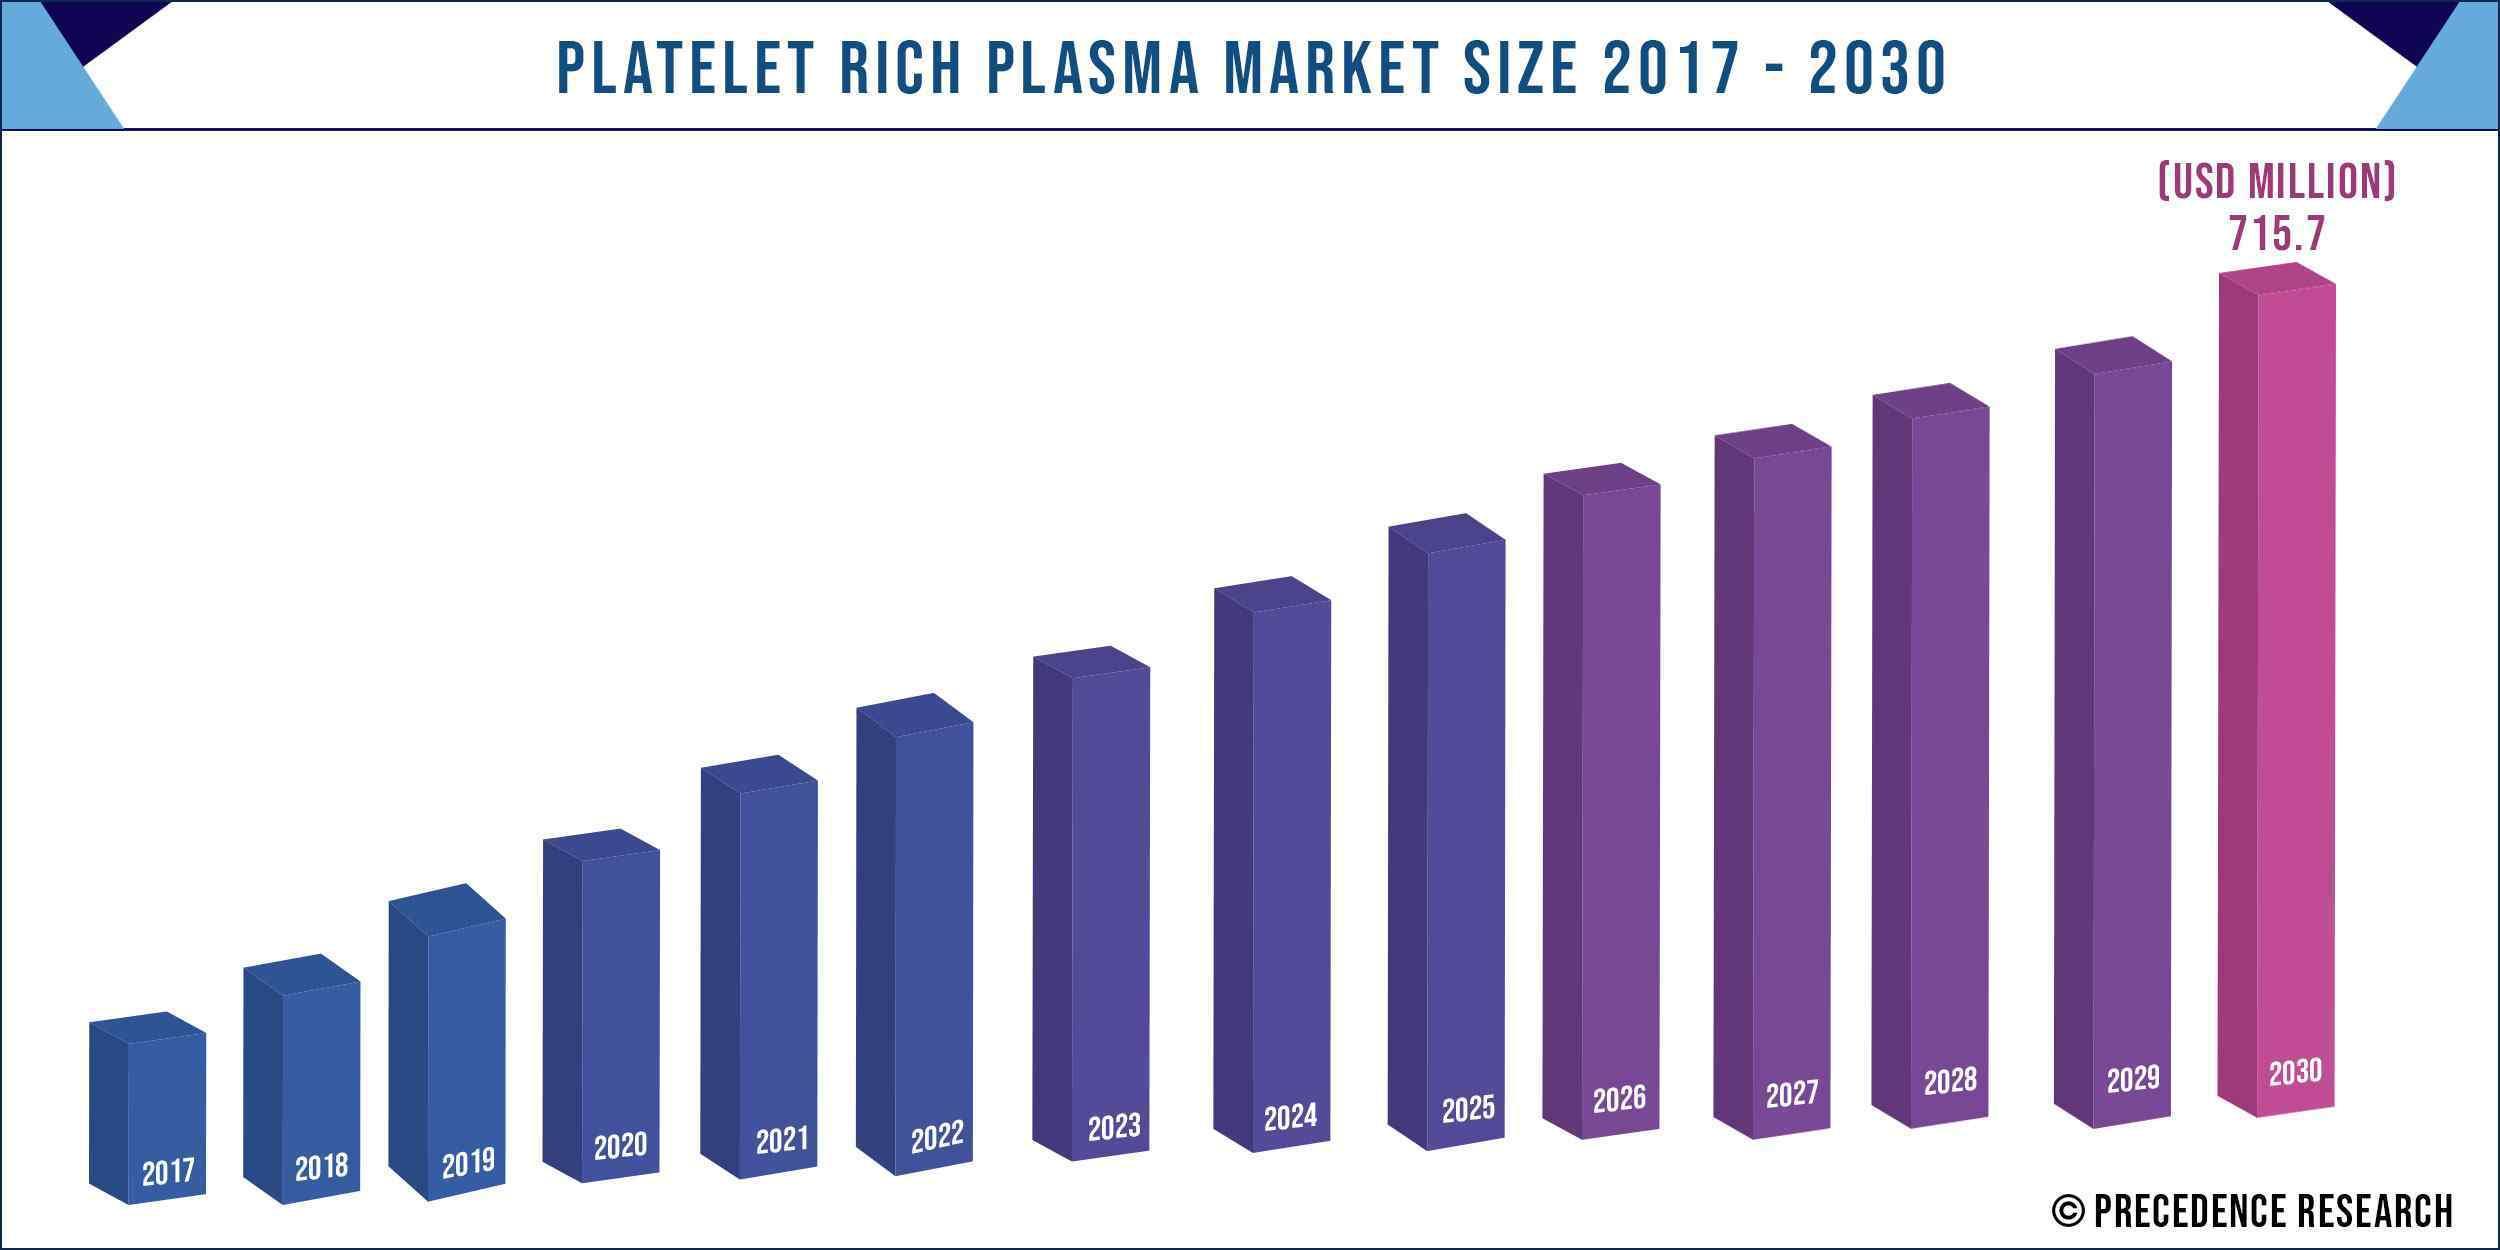 Platelet Rich Plasma Market Size 2017-2030